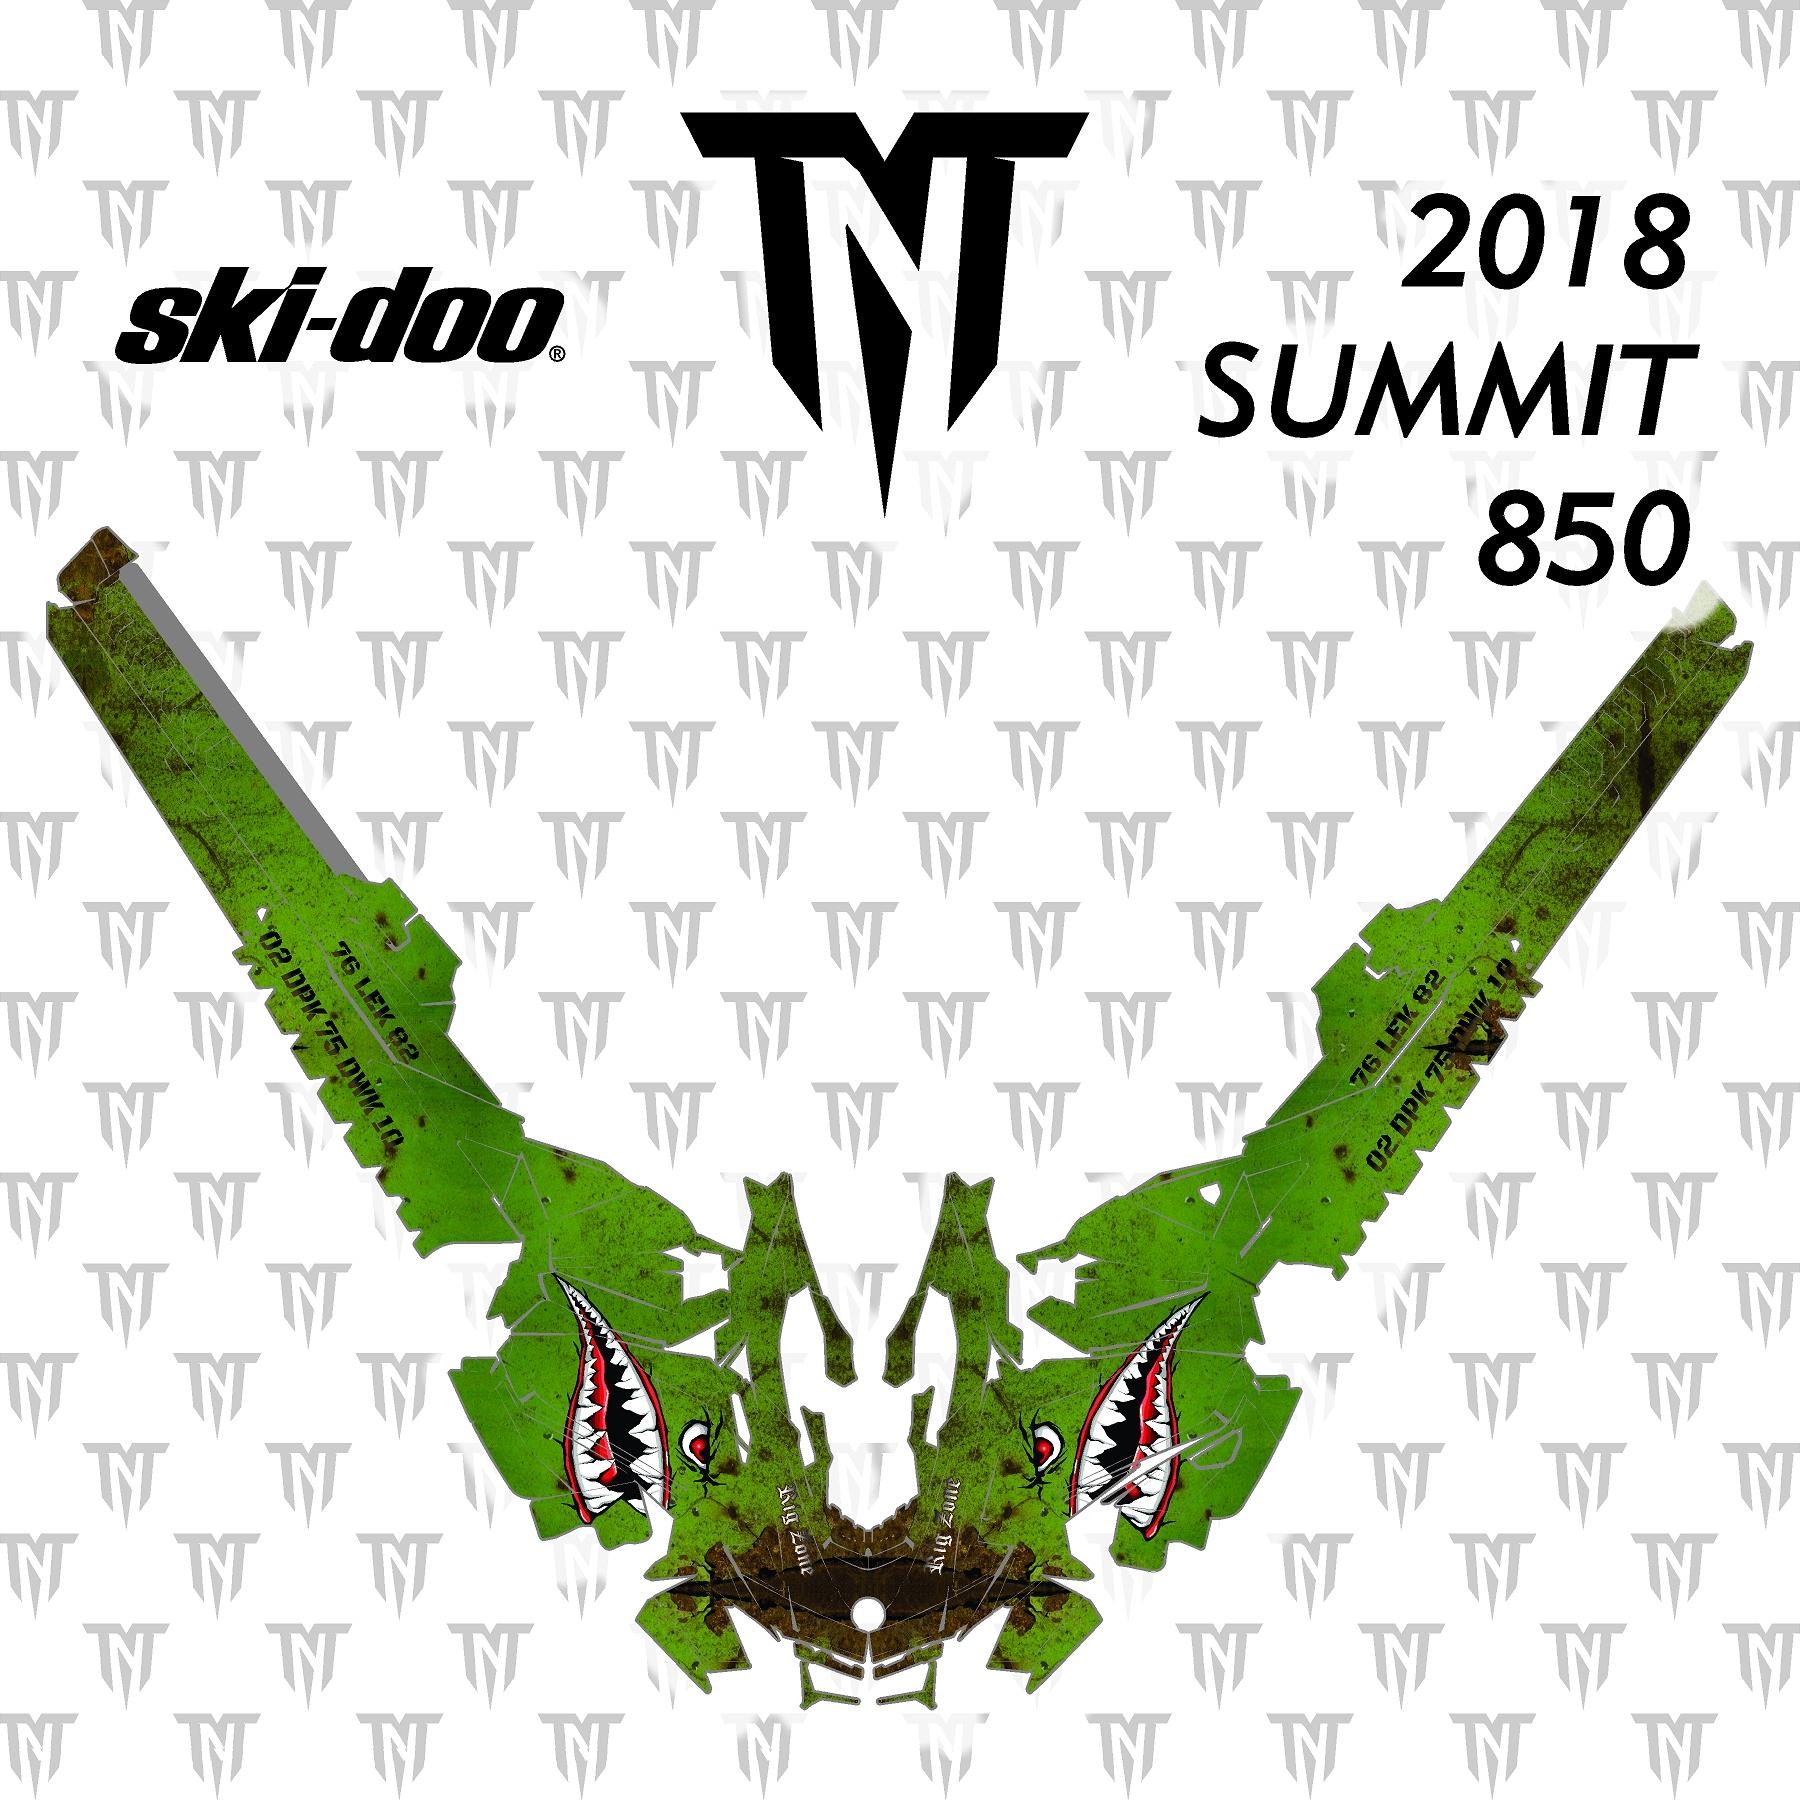 2018 Ski-Doo Summit 850